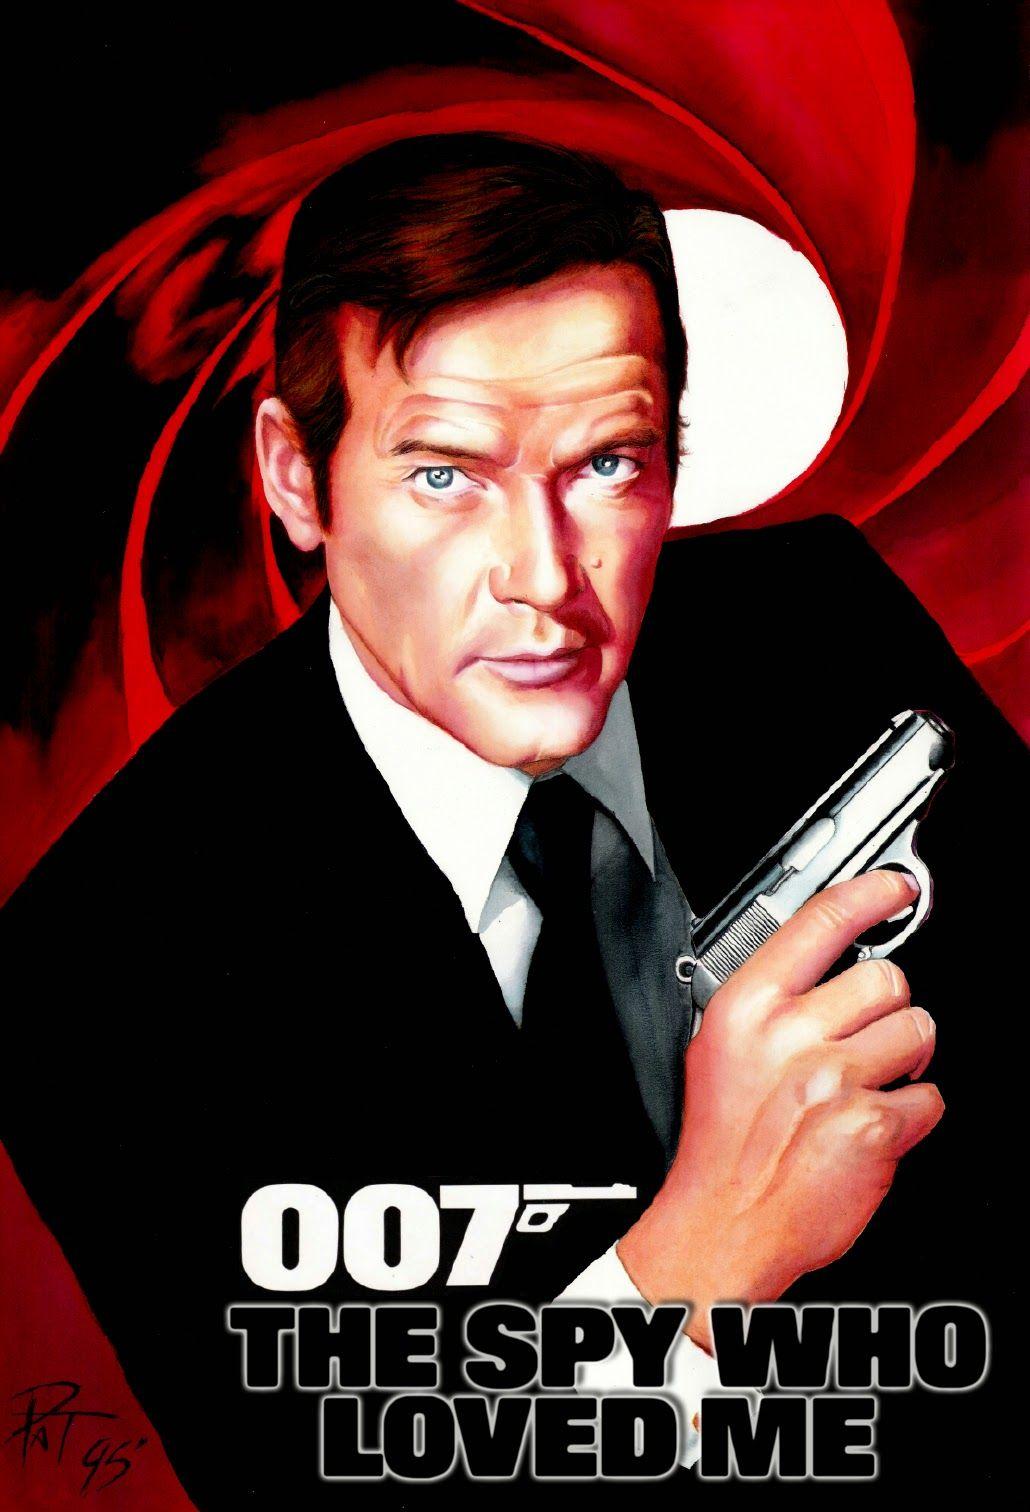 Pin De Gonzalo Hernandez Gutierrez Em 007 Filmes Agente 007 Shows